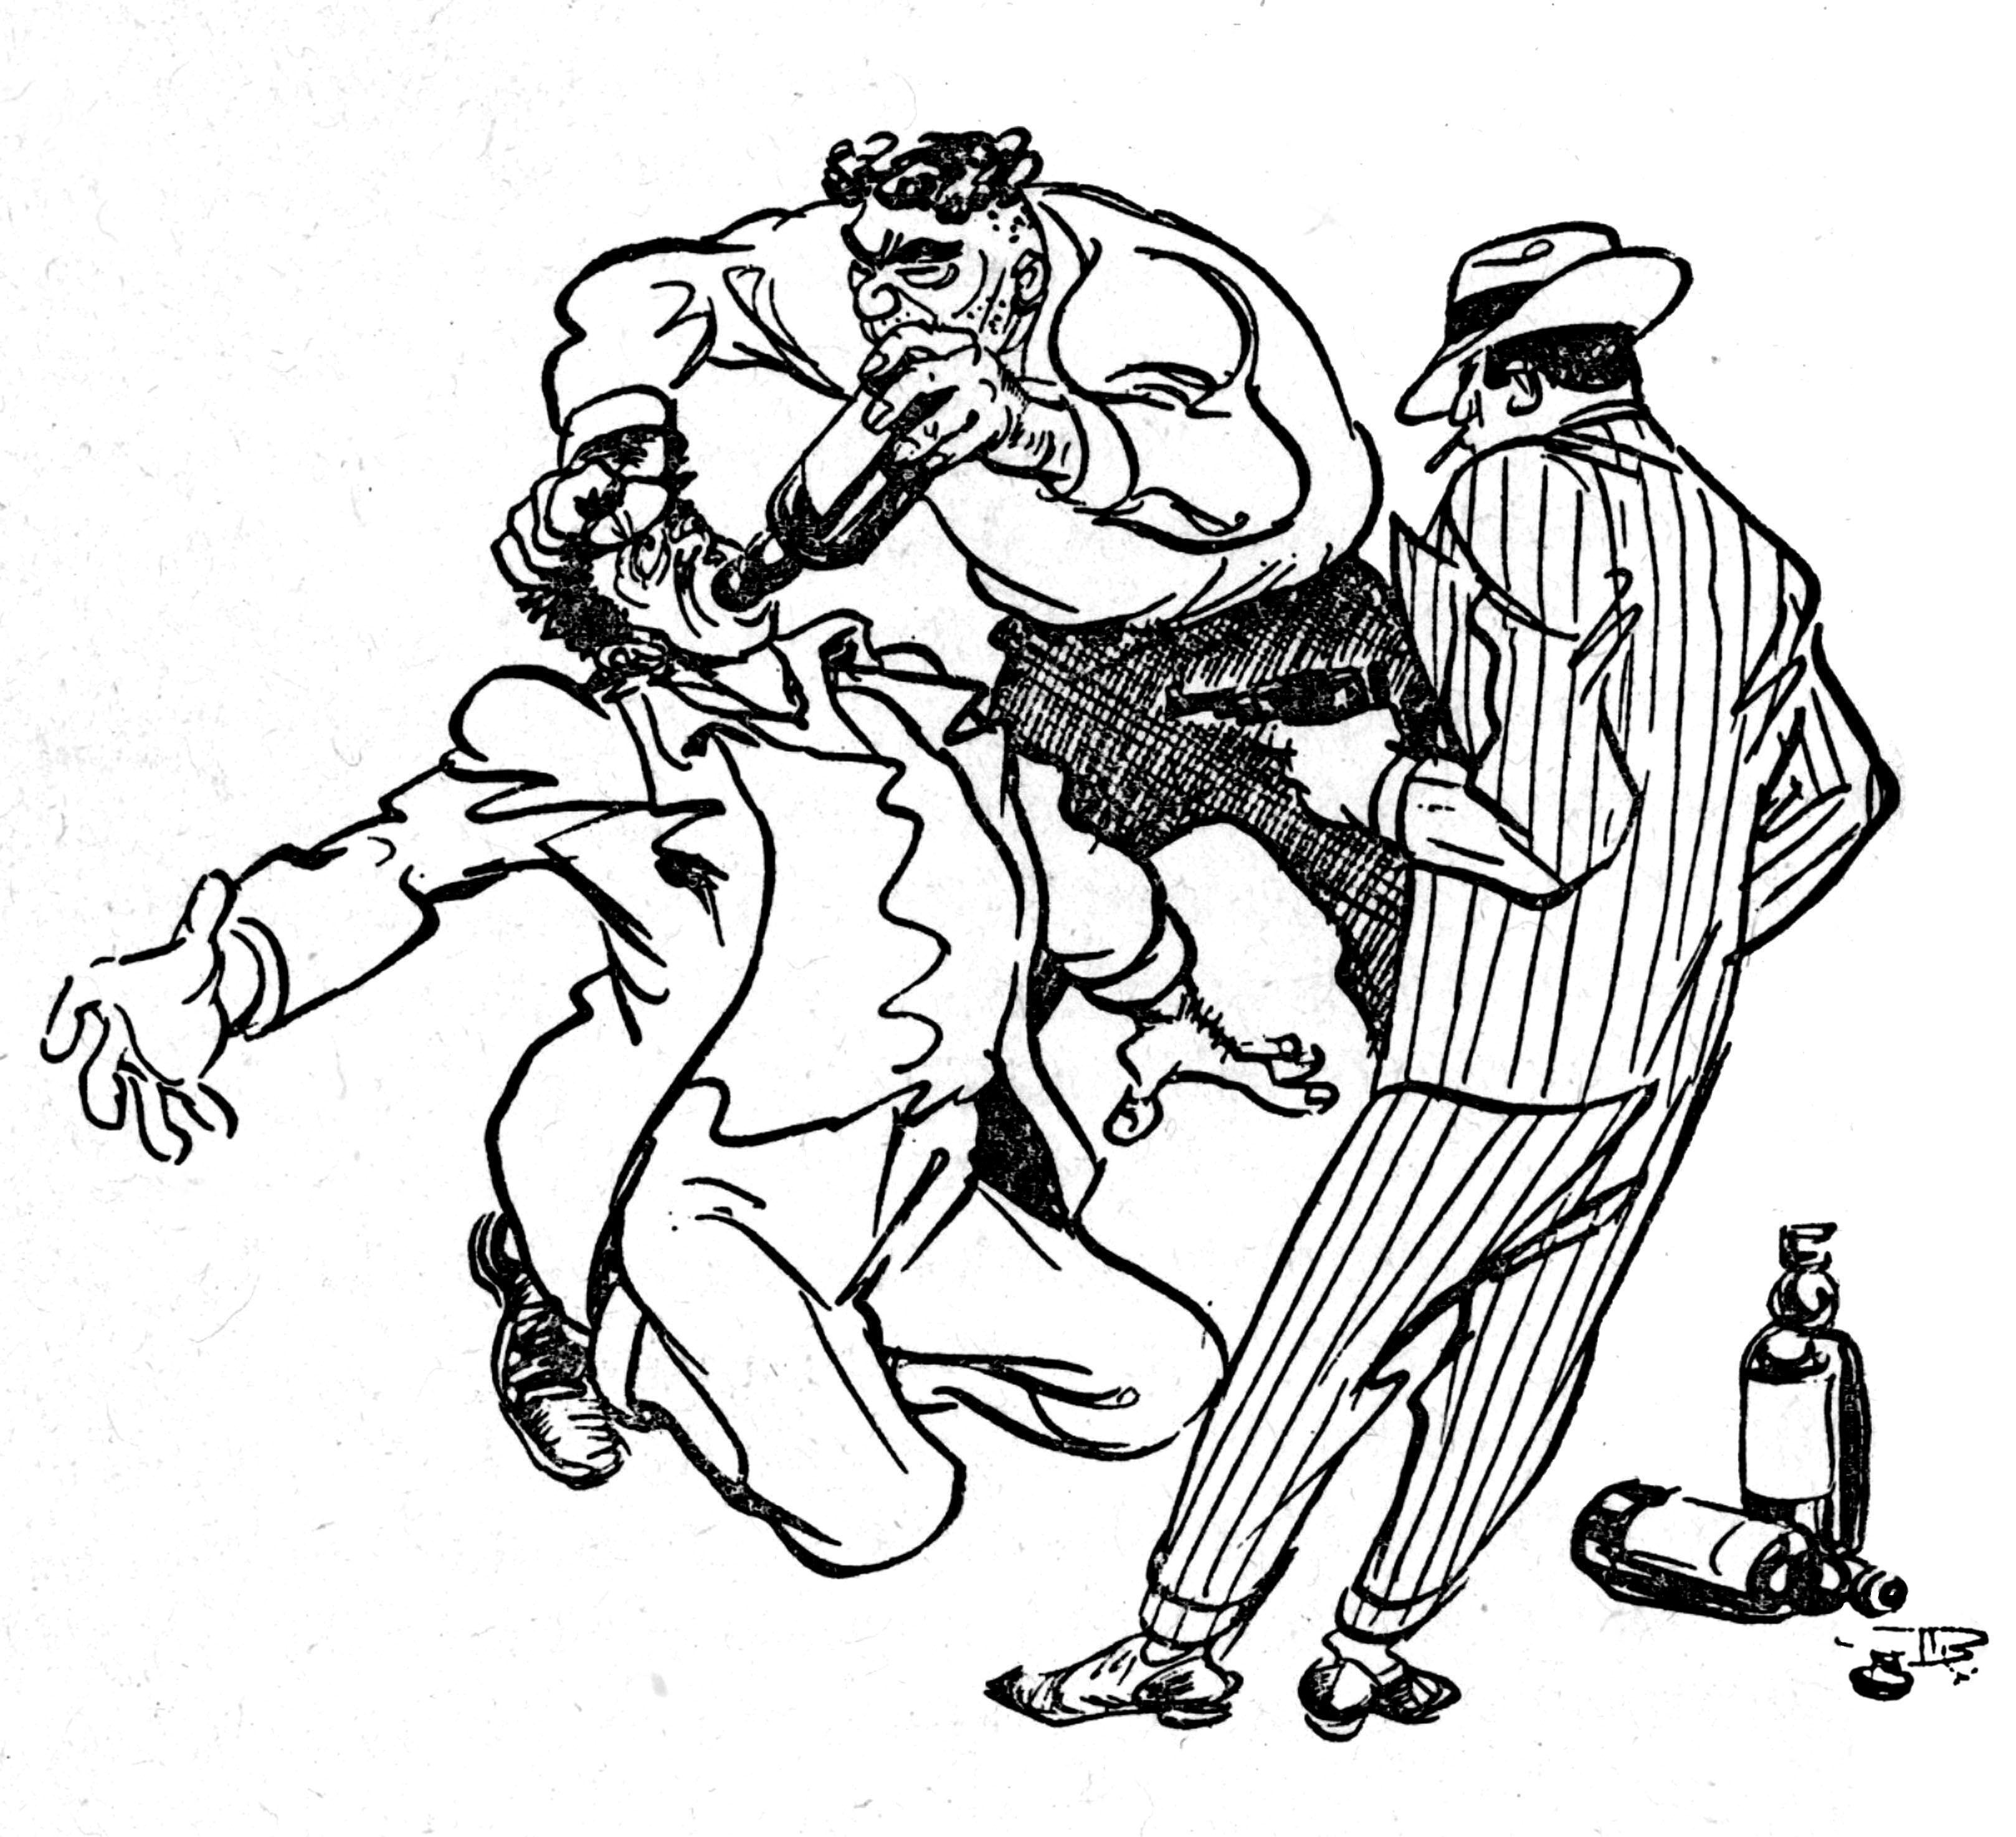 Gangster Sketches: Gangsta Cartoon Characters